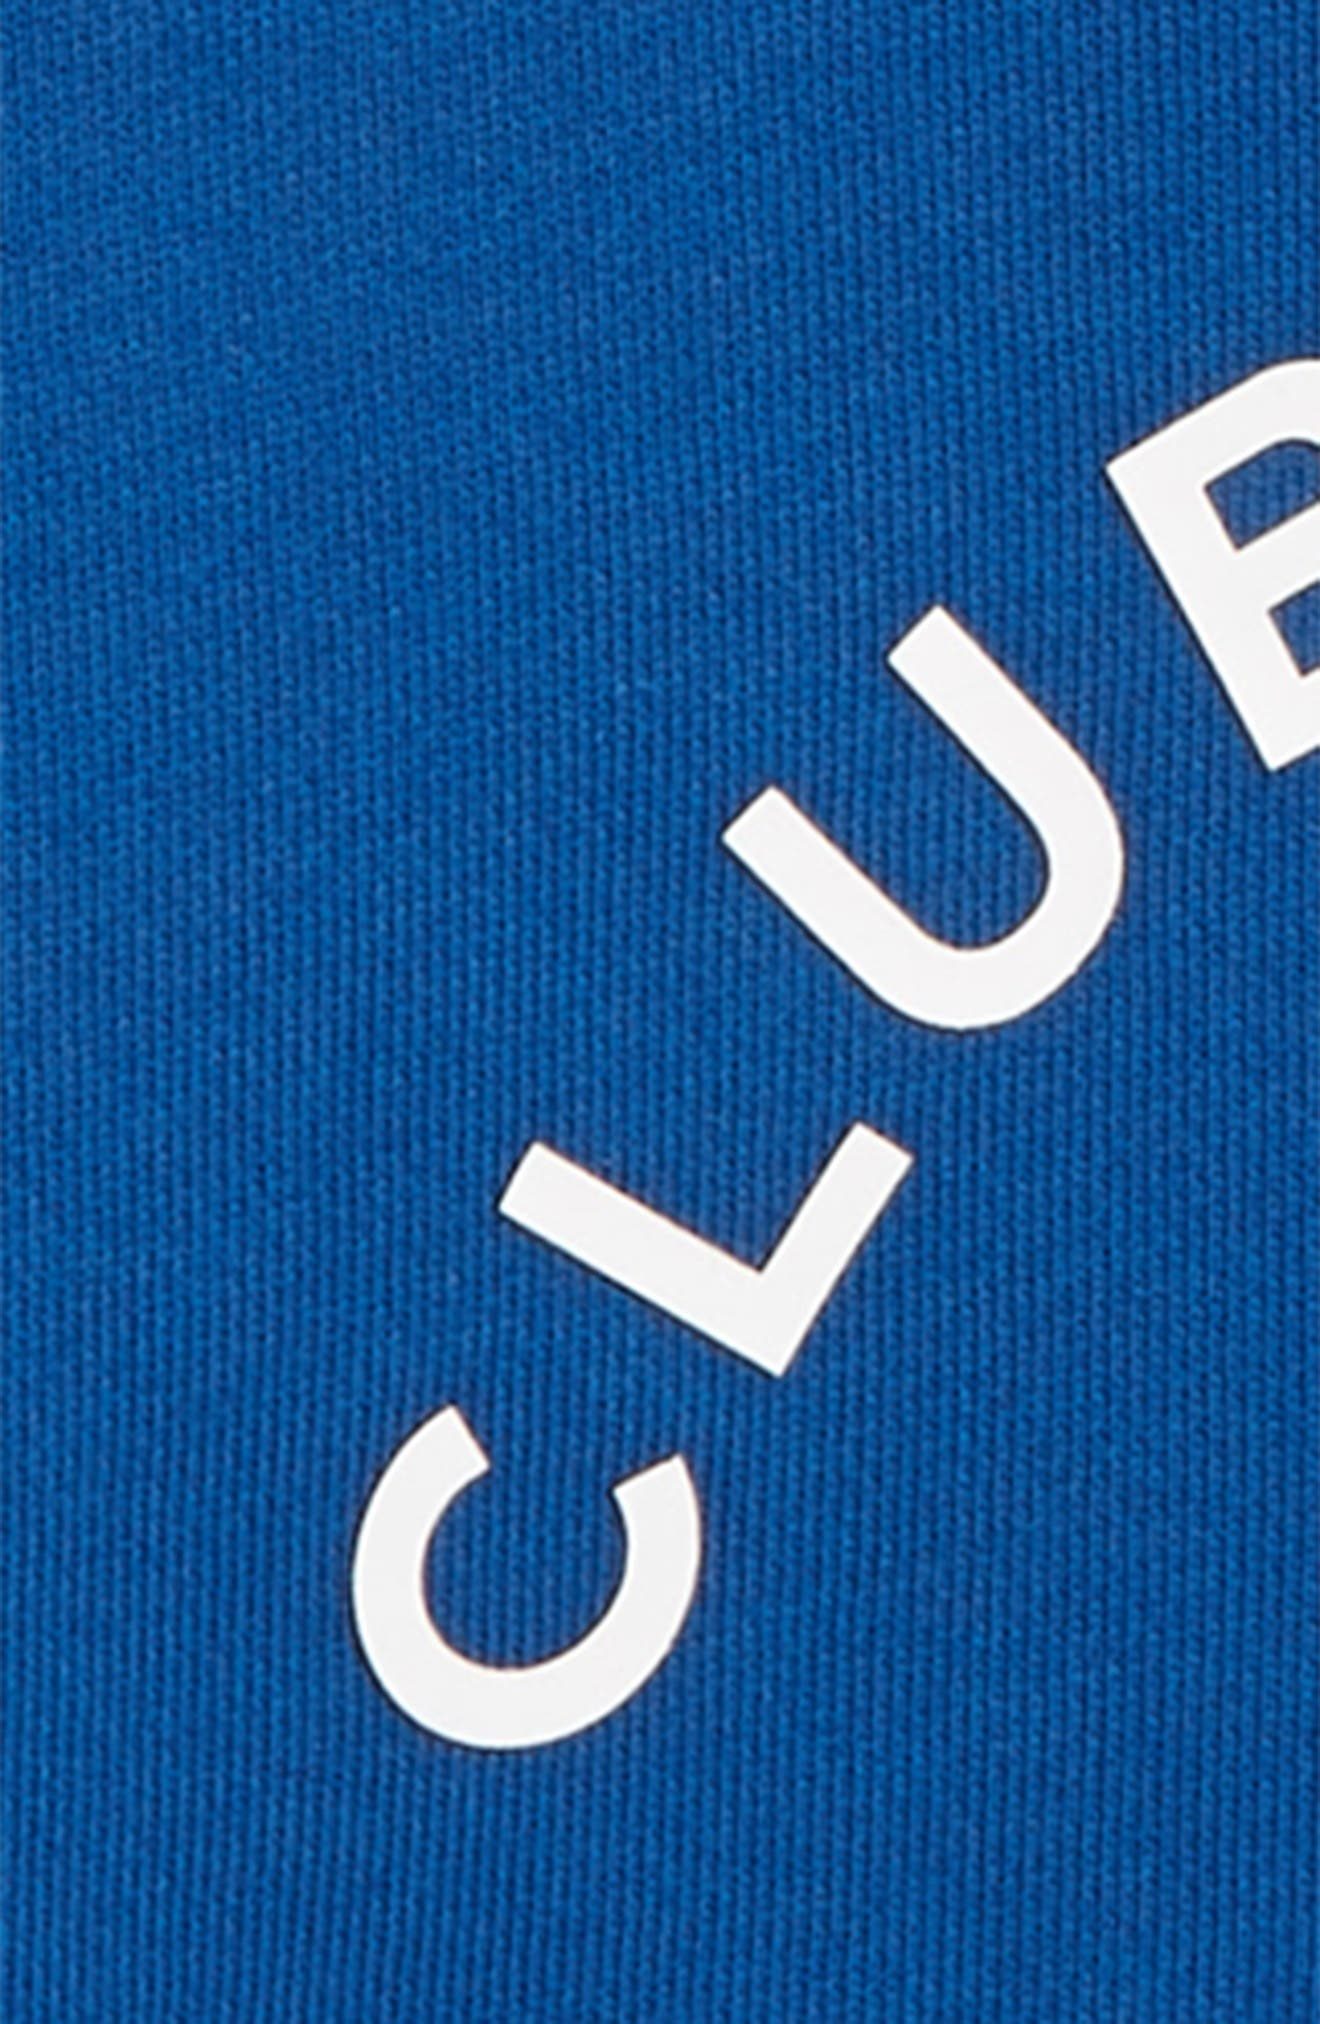 Club Nomad Sweatshirt,                             Alternate thumbnail 2, color,                             400